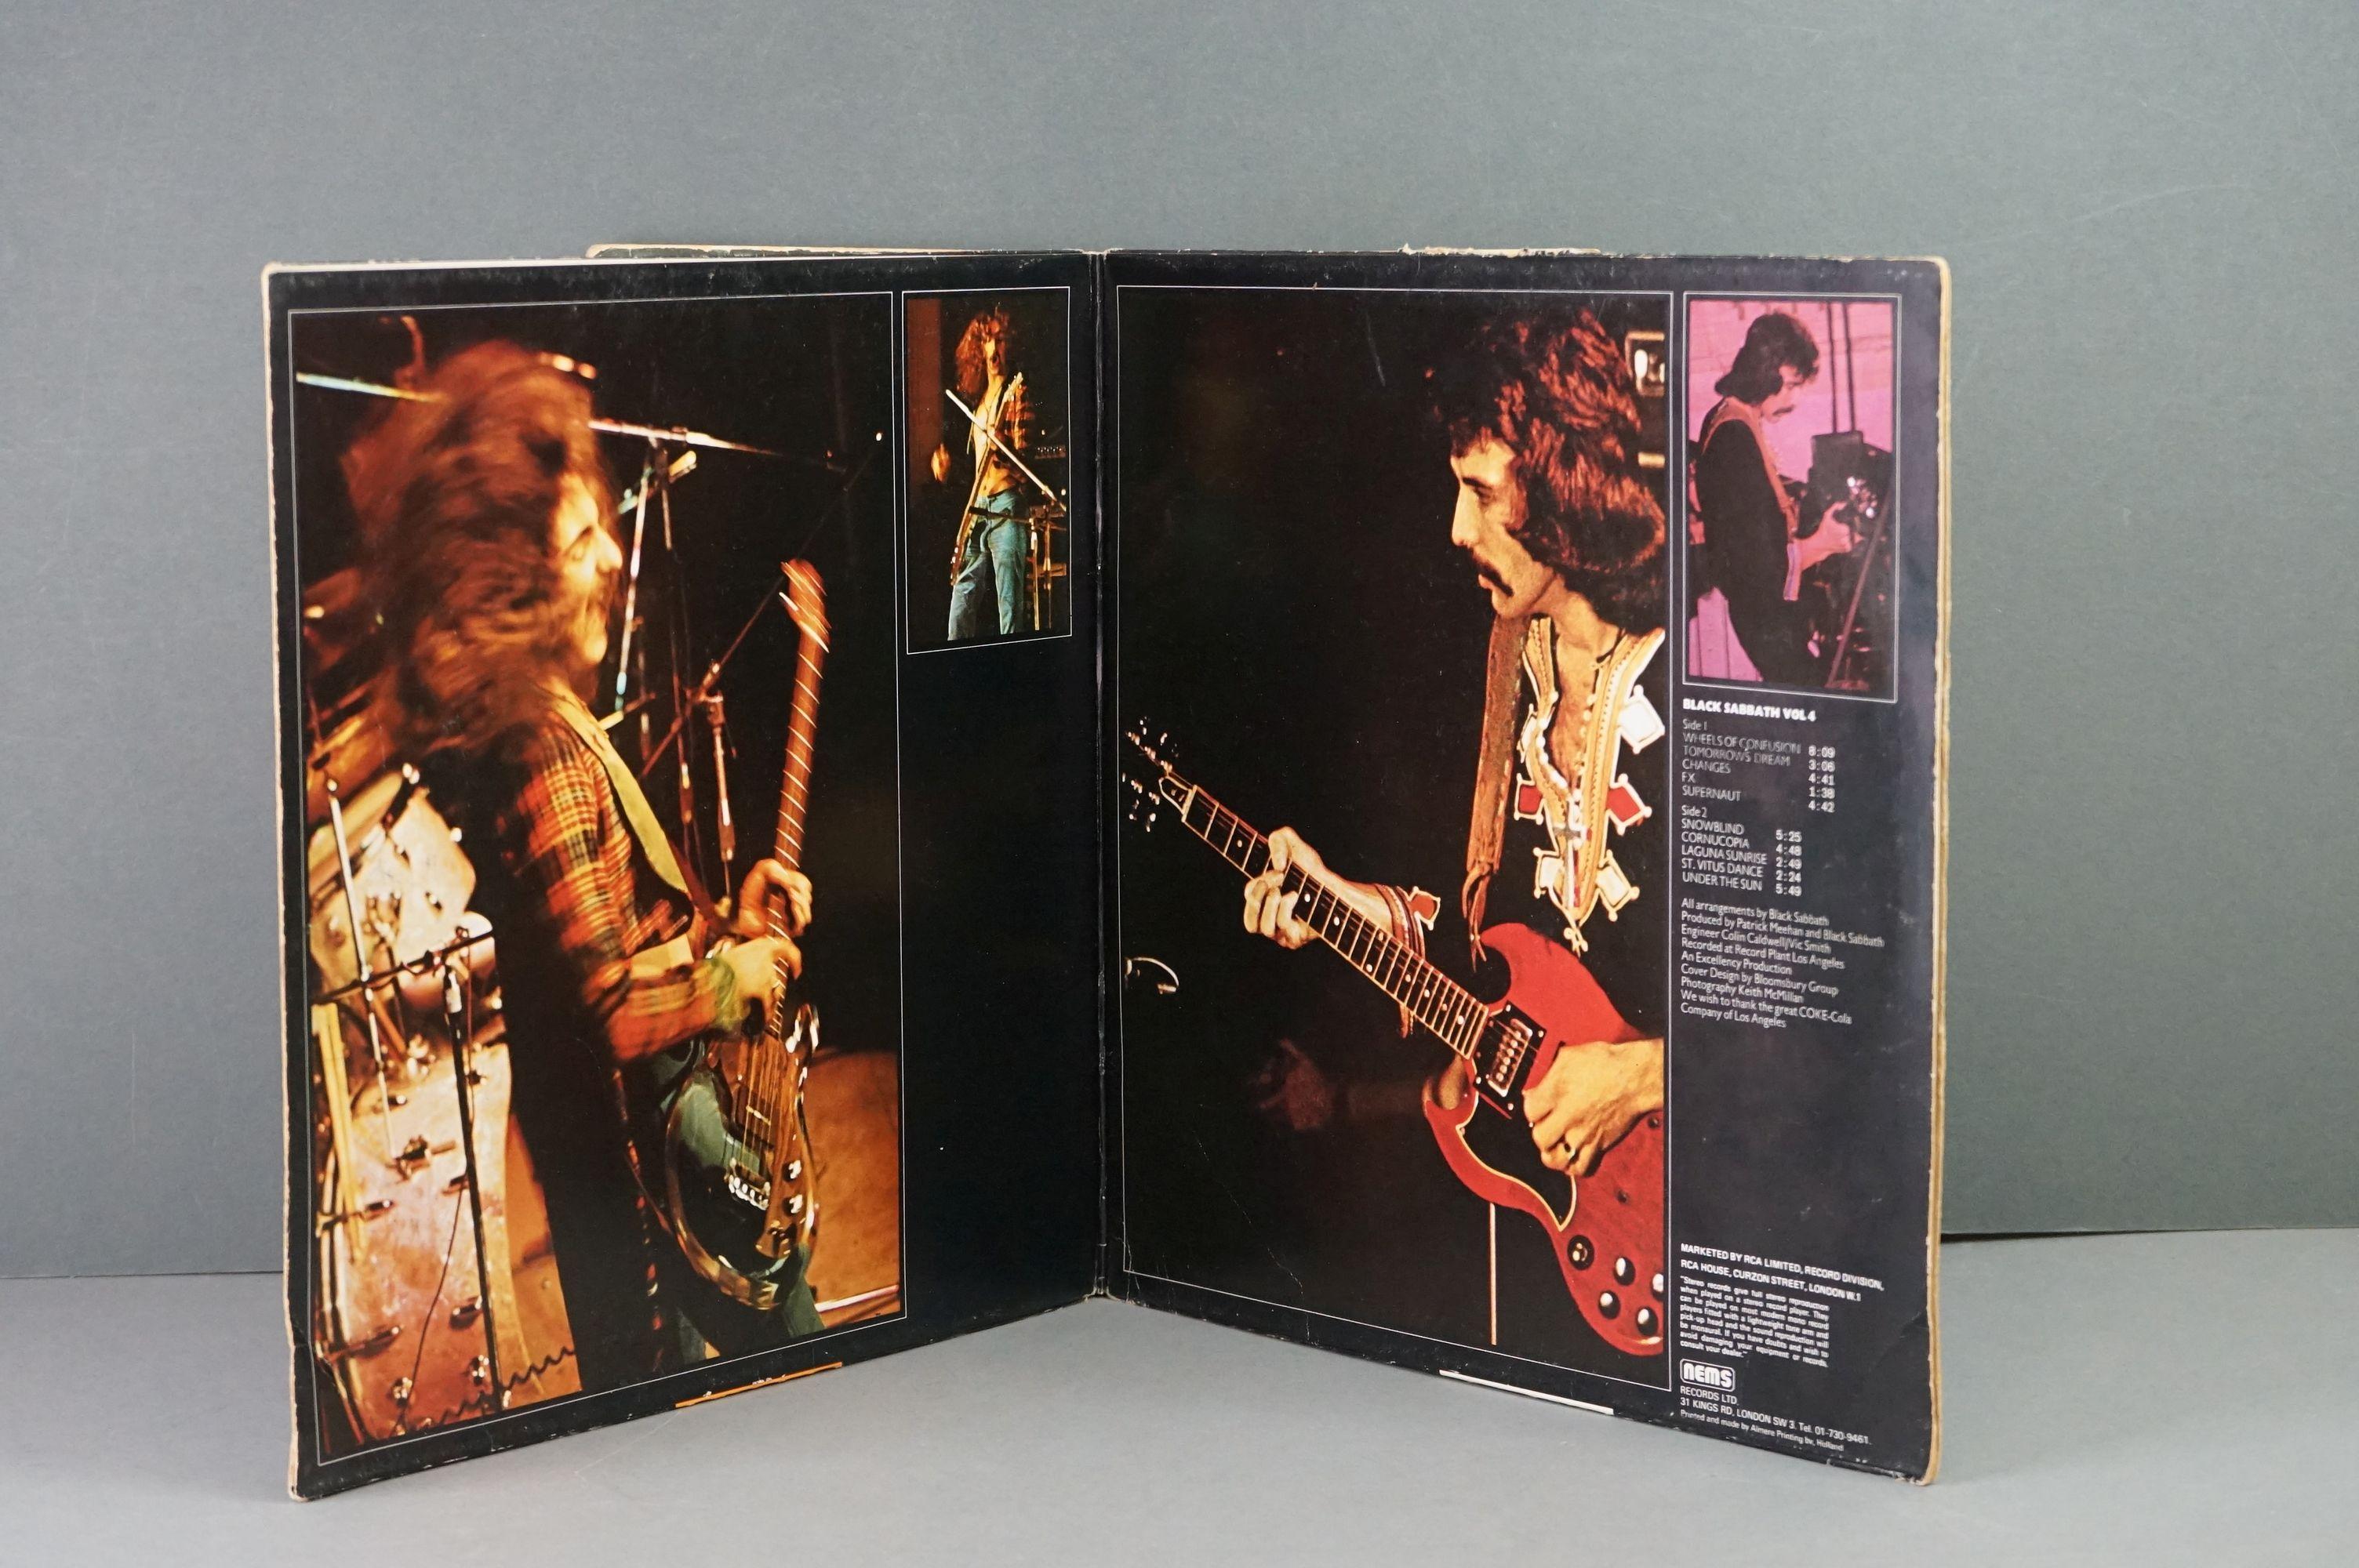 Vinyl - Twelve Black Sabbath vinyl LP's to include Technical Ecstasy (Vertigo Records PRICE 40), - Image 13 of 17